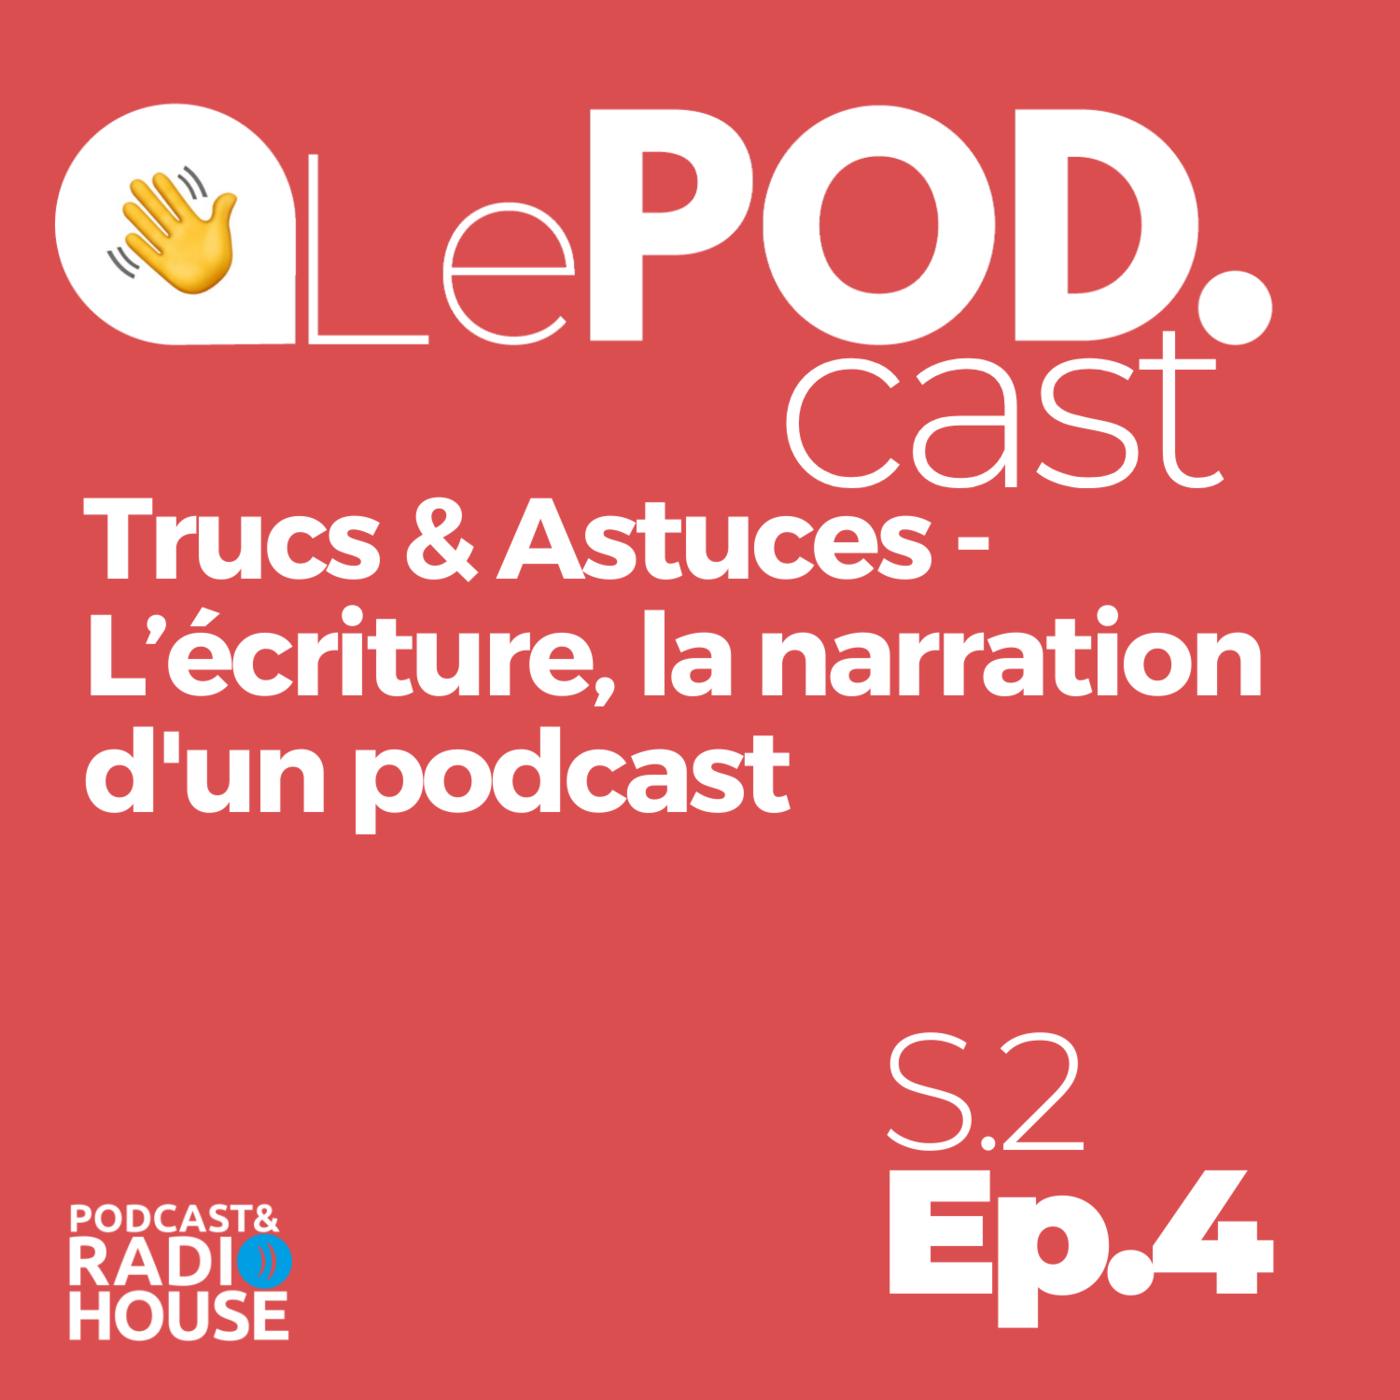 EP.4 - Trucs & Astuces - L'écriture, la narration d'un podcast - Le POD.